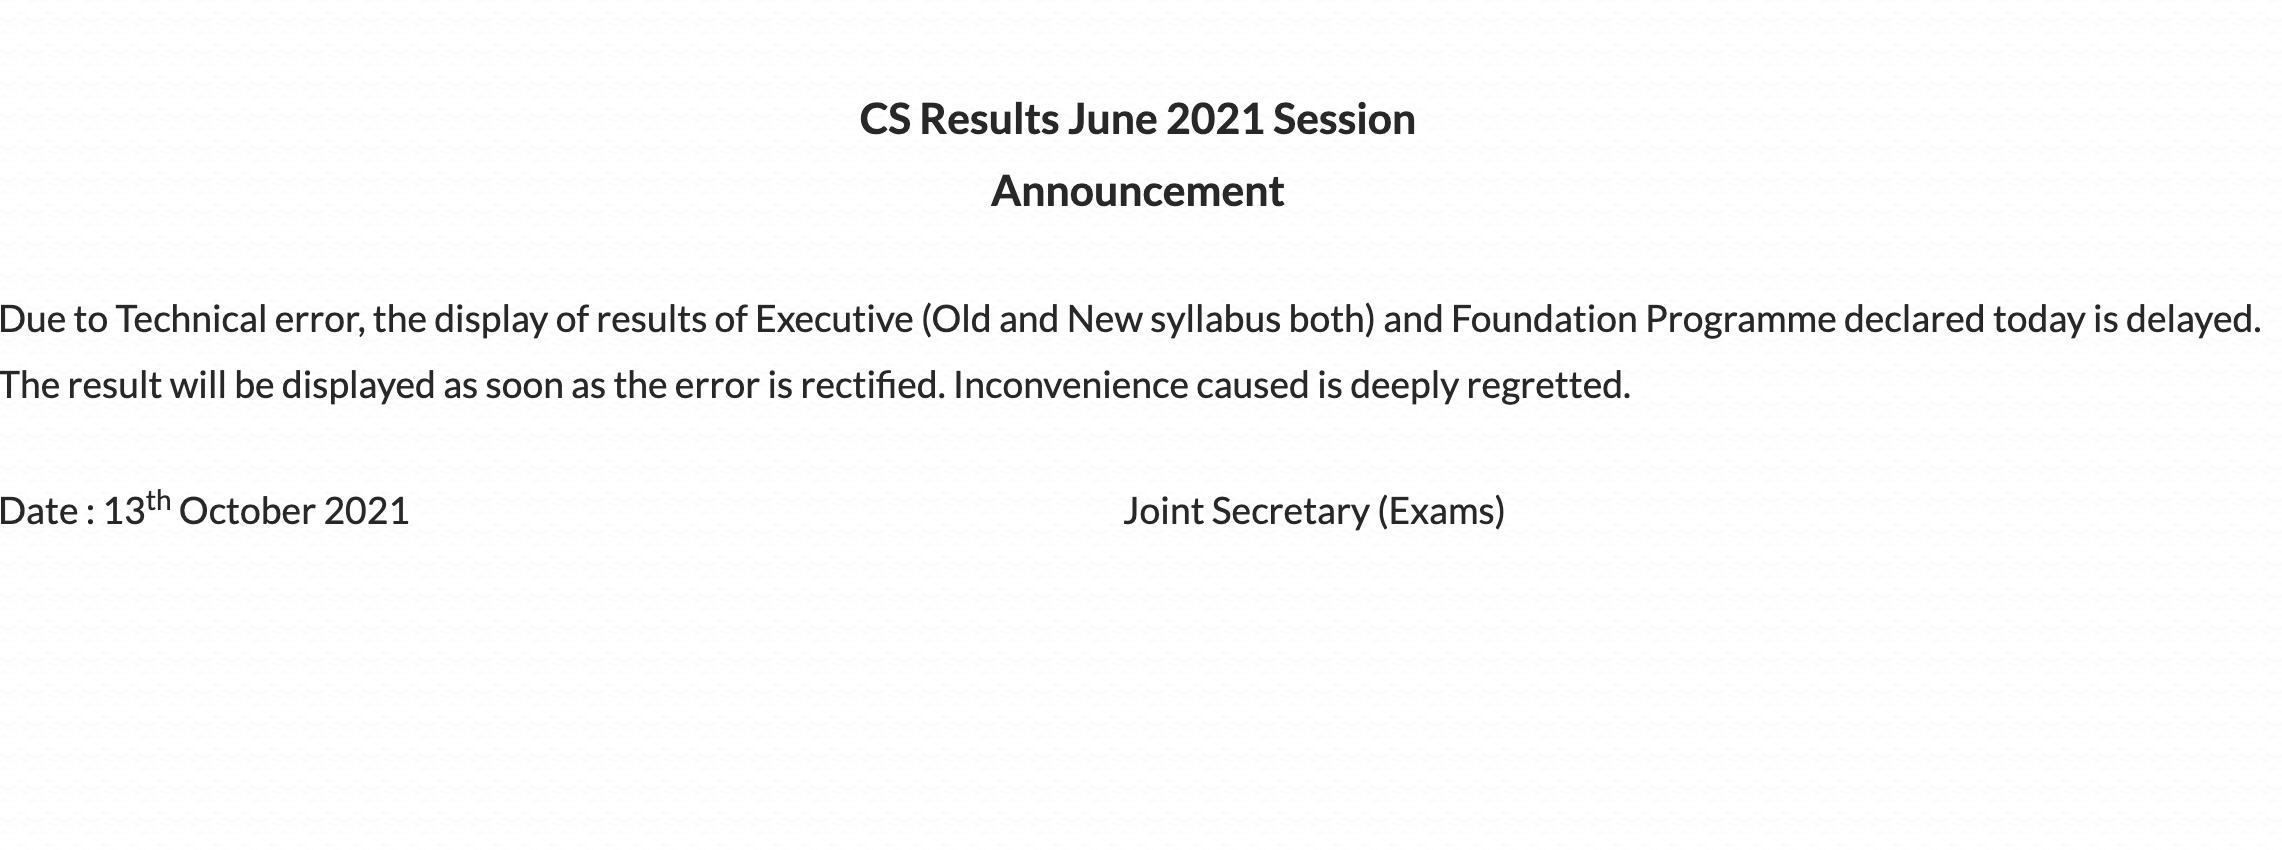 icsi cs june result, icsi cs june 2021 result, icsi cs june result 2021, icsi.edu, icsi.edu result, icsi cs foundation result, icsi cs professional result, icsi cs executive result, icsi.edu result, icsi cs result 2021, icsi exam result, icsi result, icsi result 2021, icsi results, icsi result august 2021,icsi executive result, icsi smash, icsi admit card